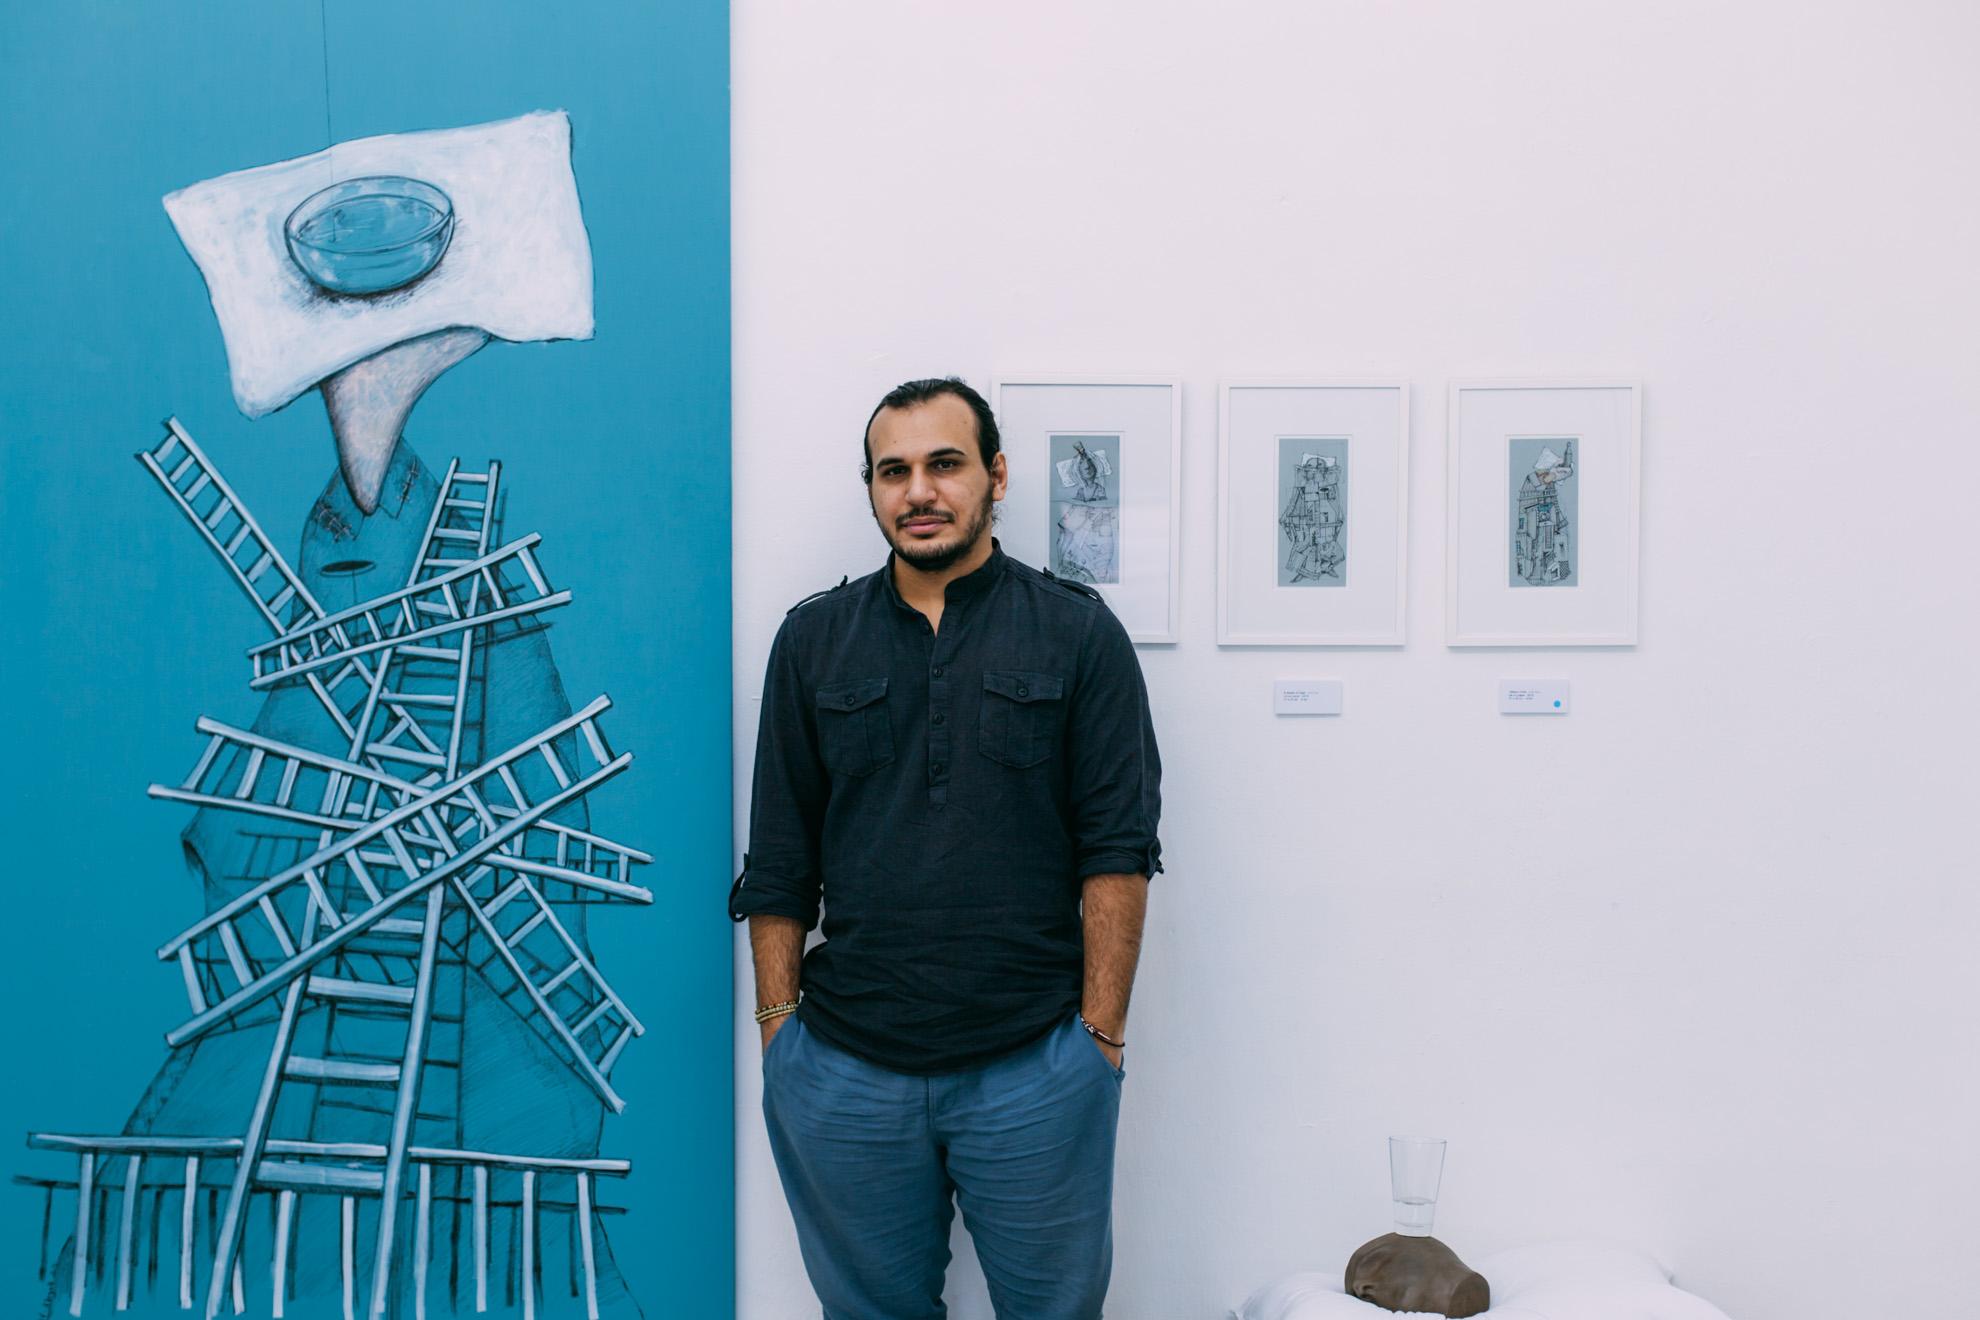 Mohamad Khayata Syrie Liban Mehdi Drissi